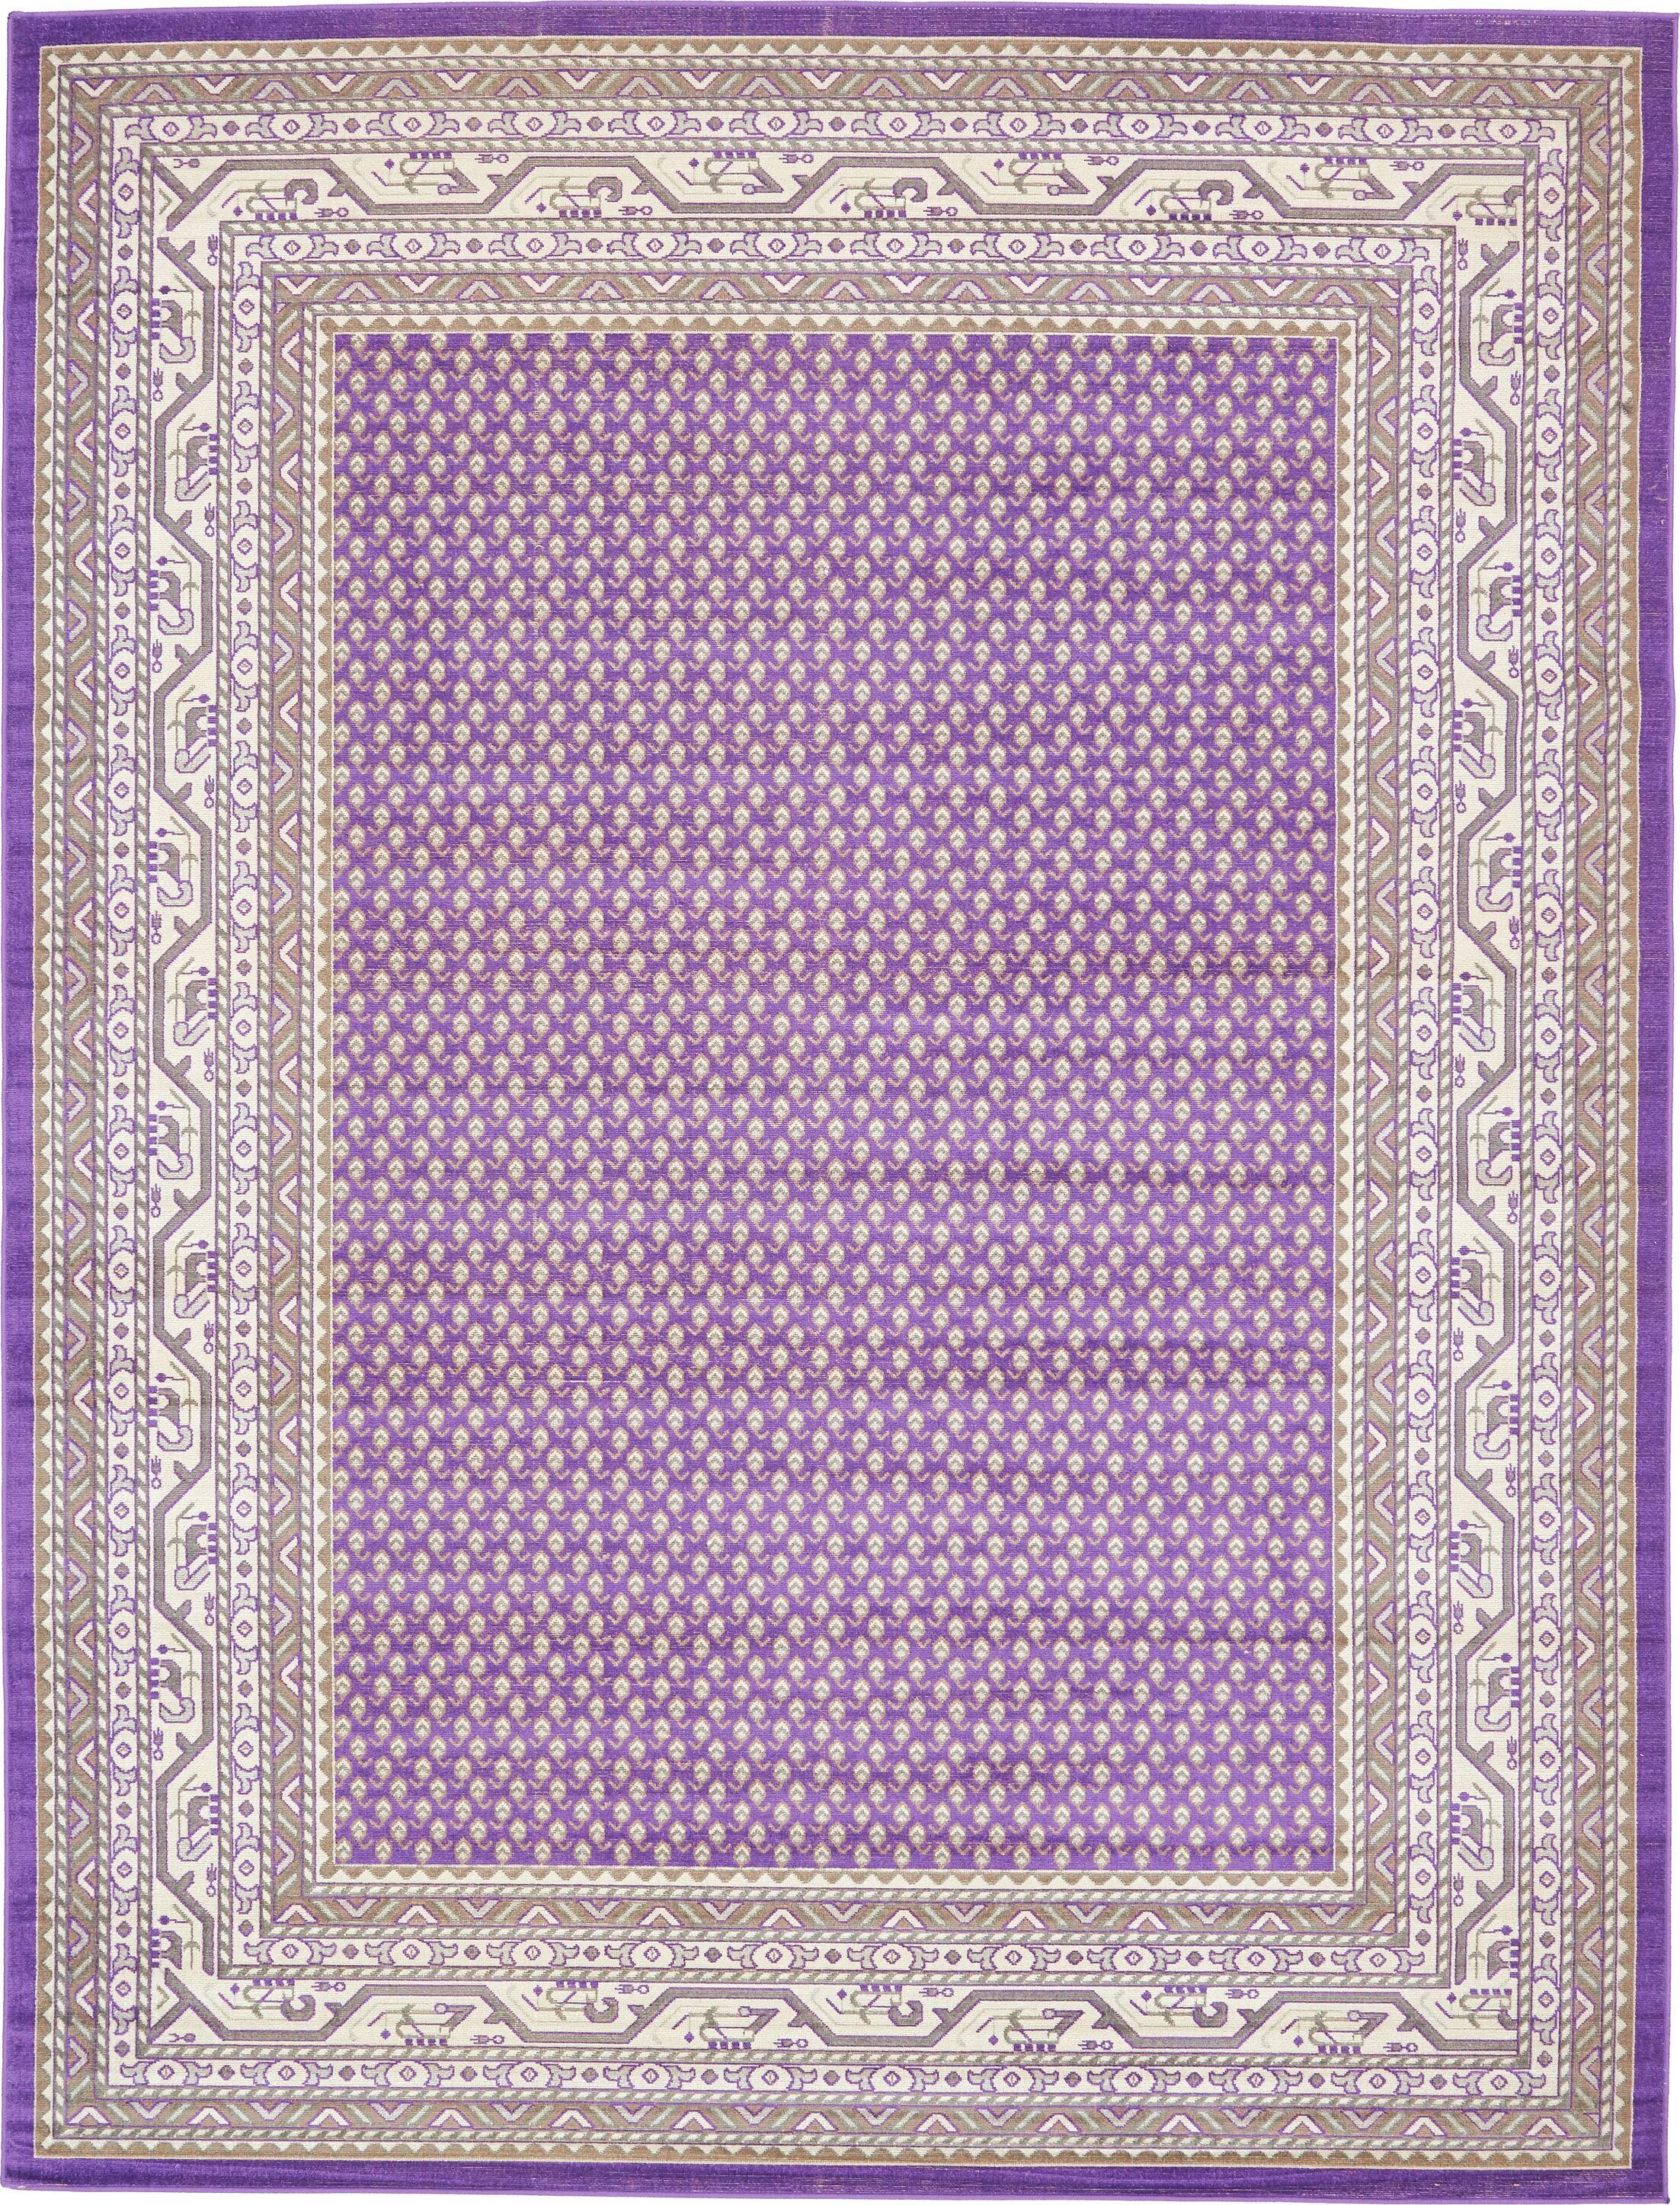 Gillam Violet Area Rug Rug Size: Rectangle 9' x 12'